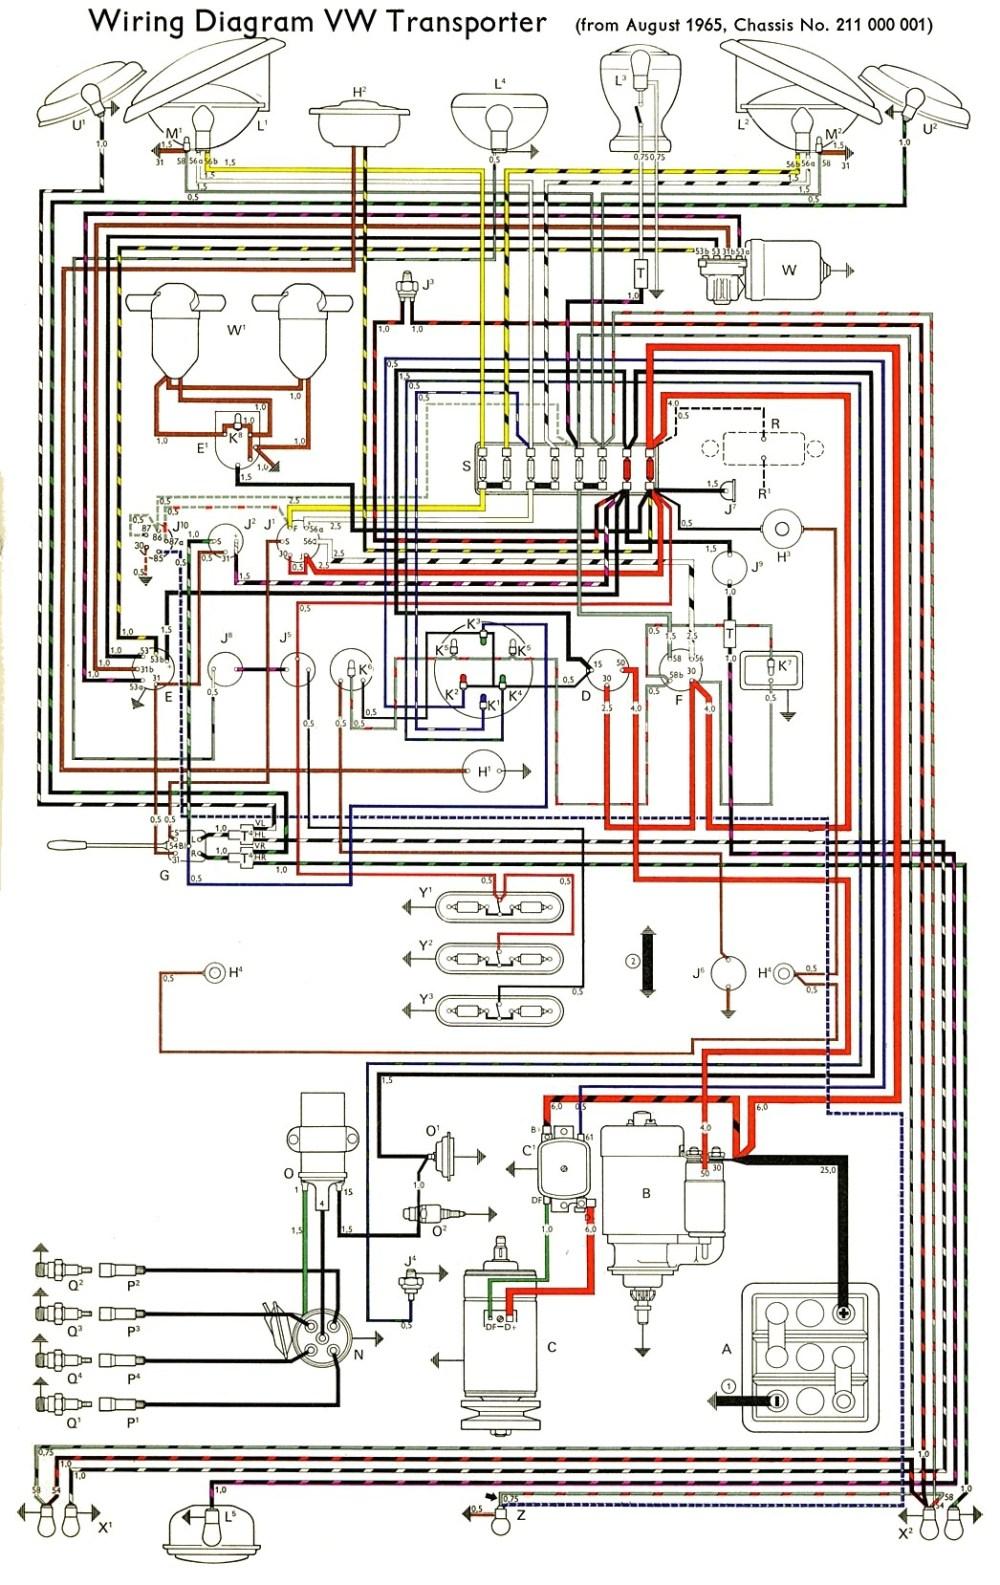 medium resolution of van hool bus wiring diagrams wiring diagram list van hool bus wiring diagrams